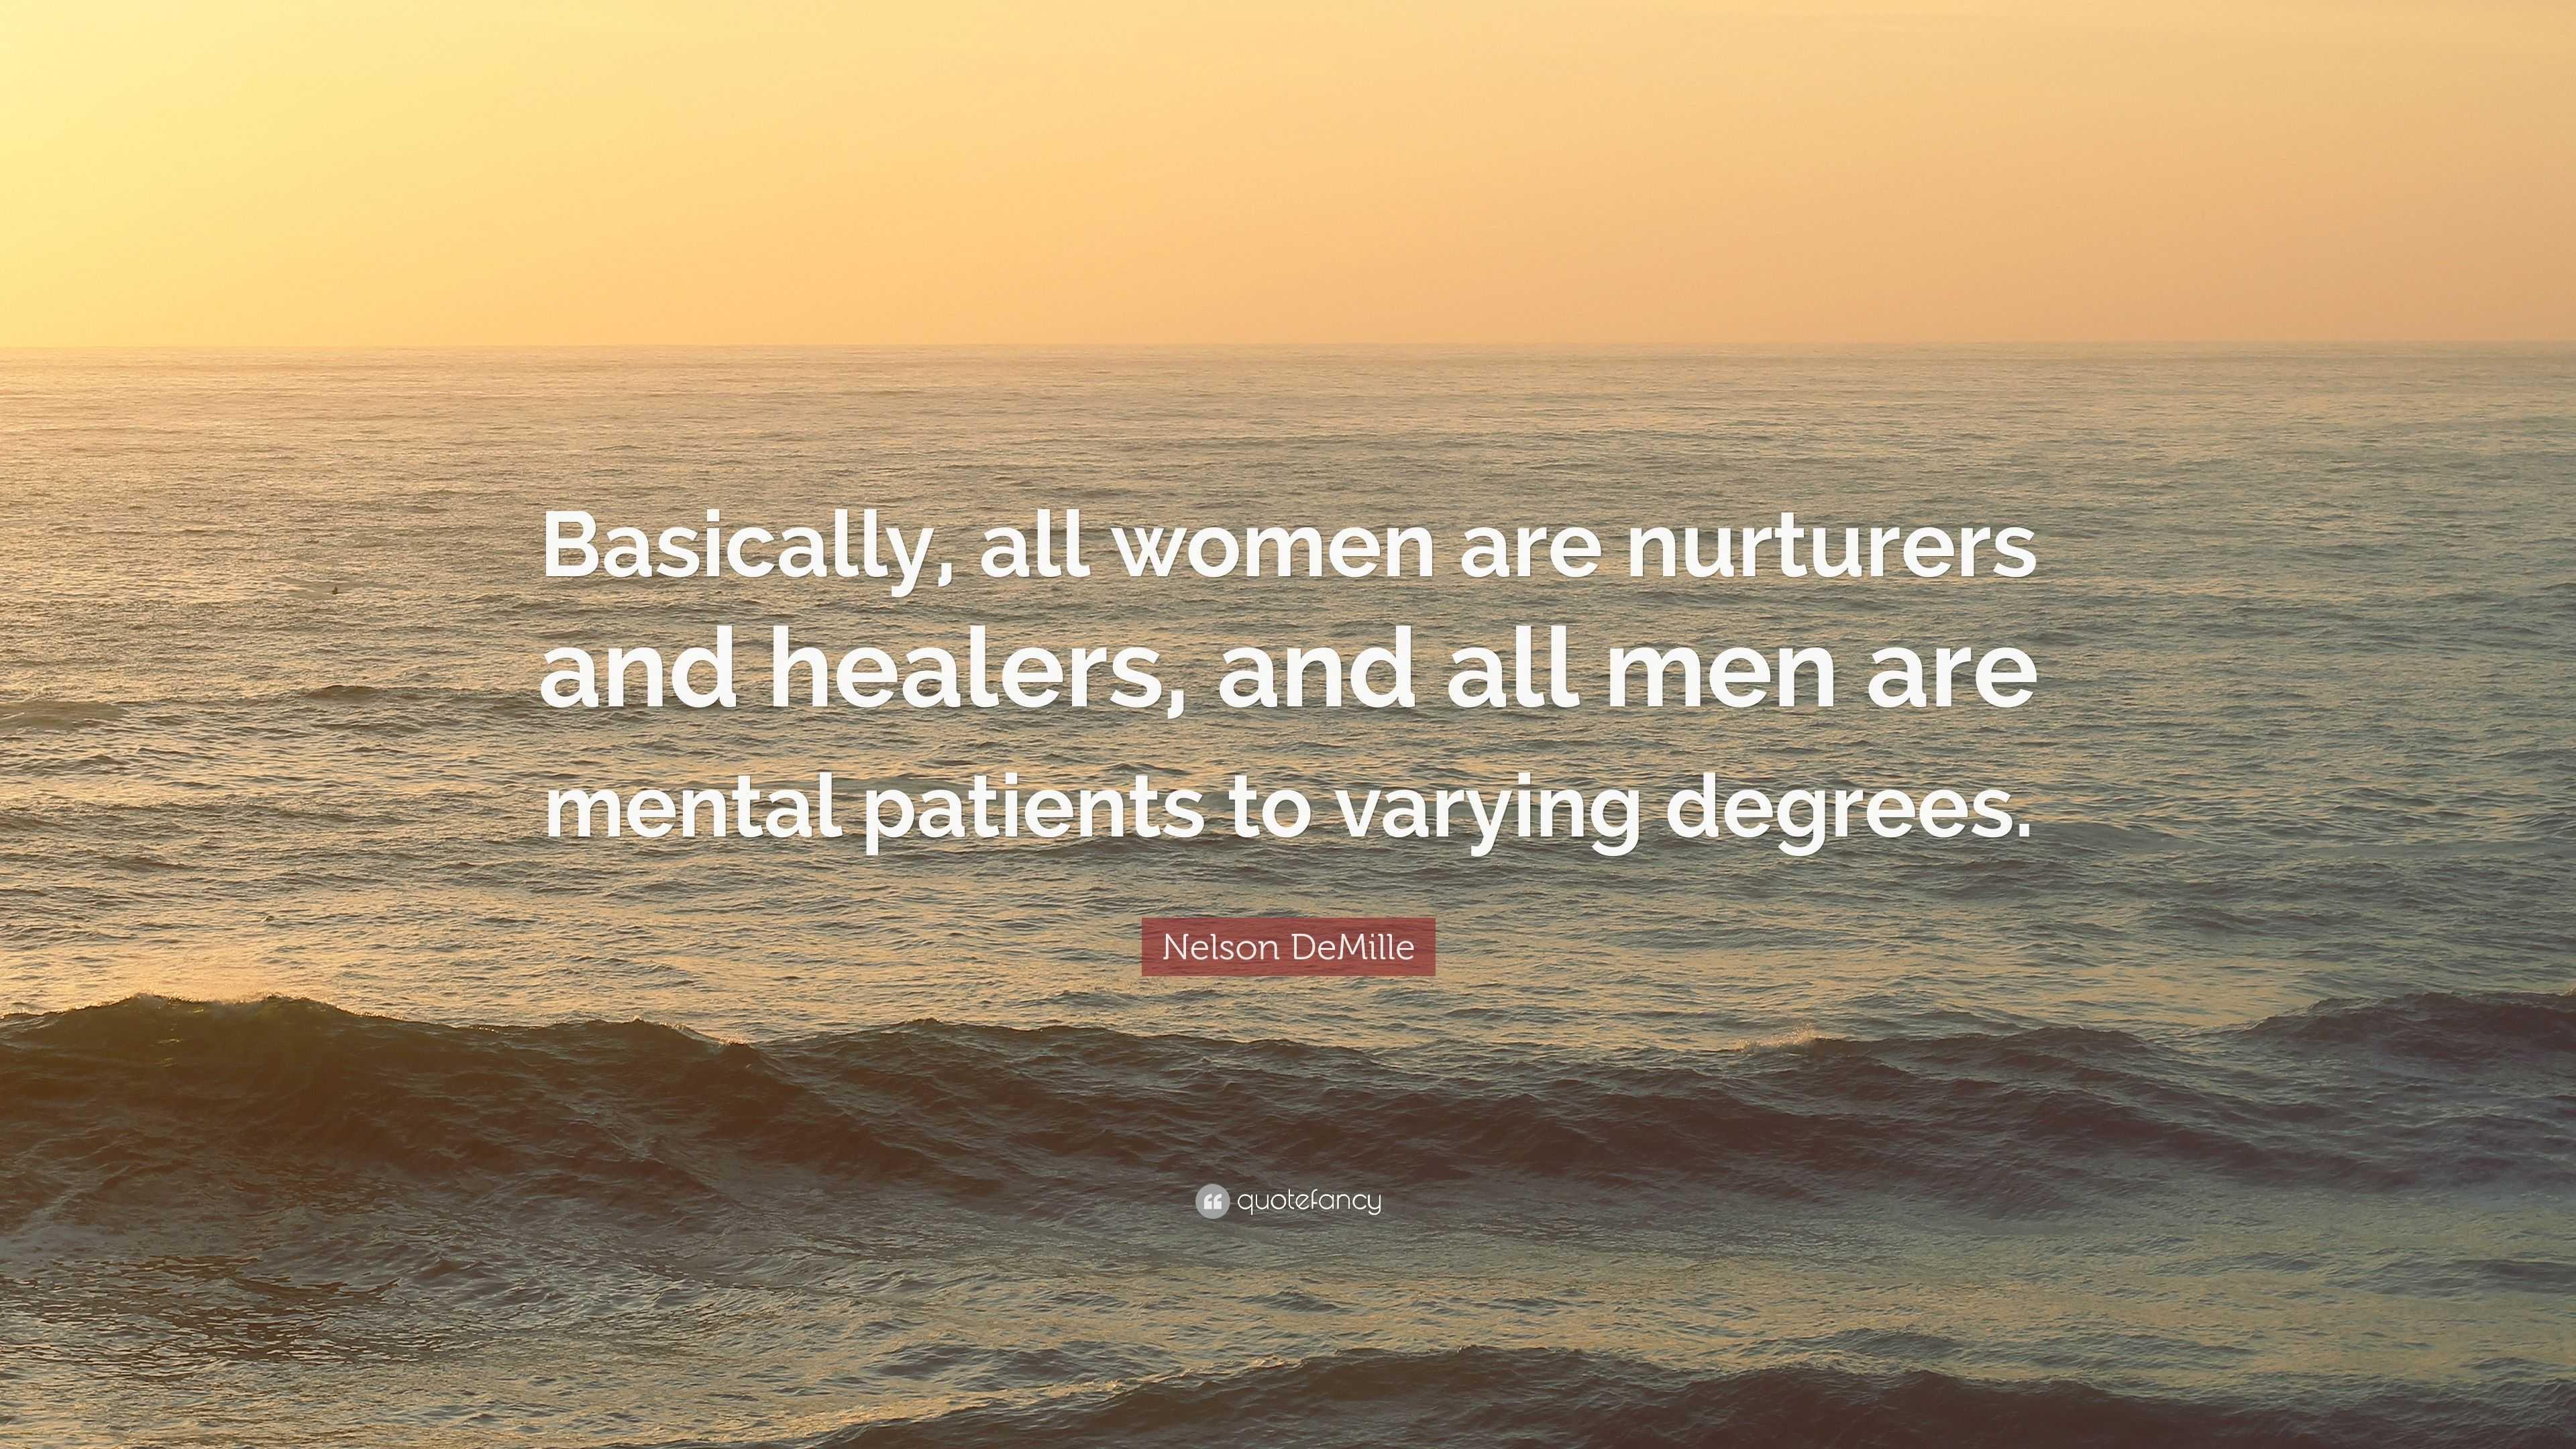 Nelson DeMille Quote: Basically, all women are nurturers